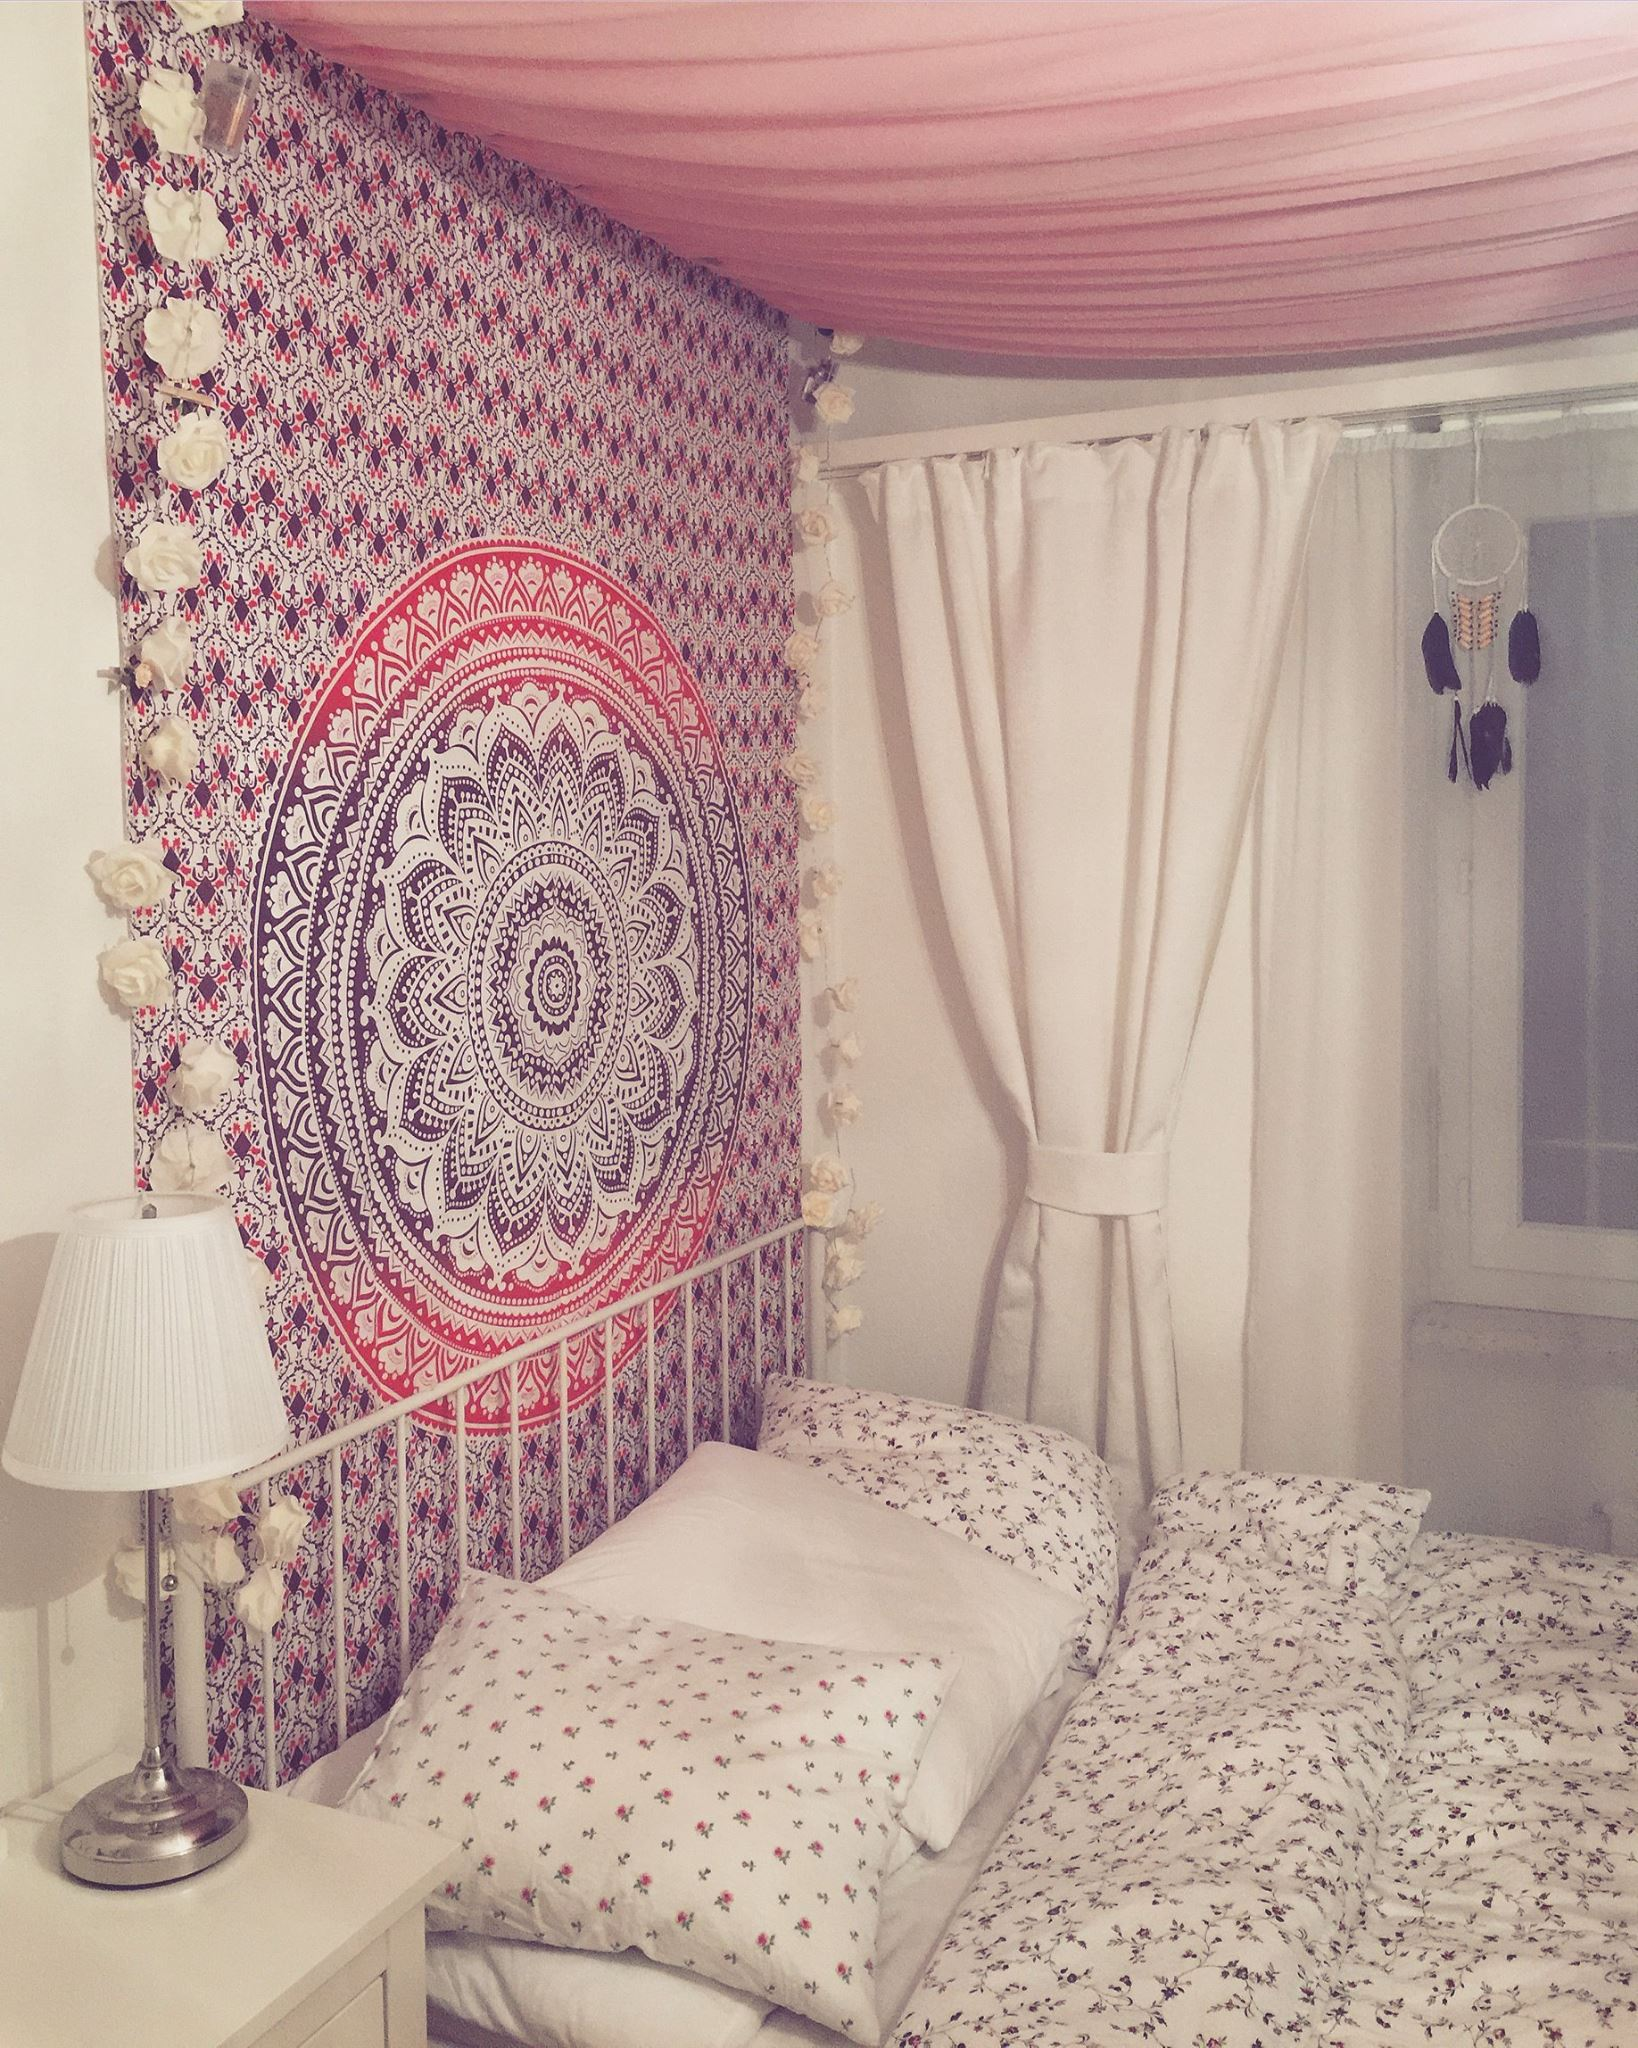 Mandala Wandtuch mit Farbverlauf in lila rosa